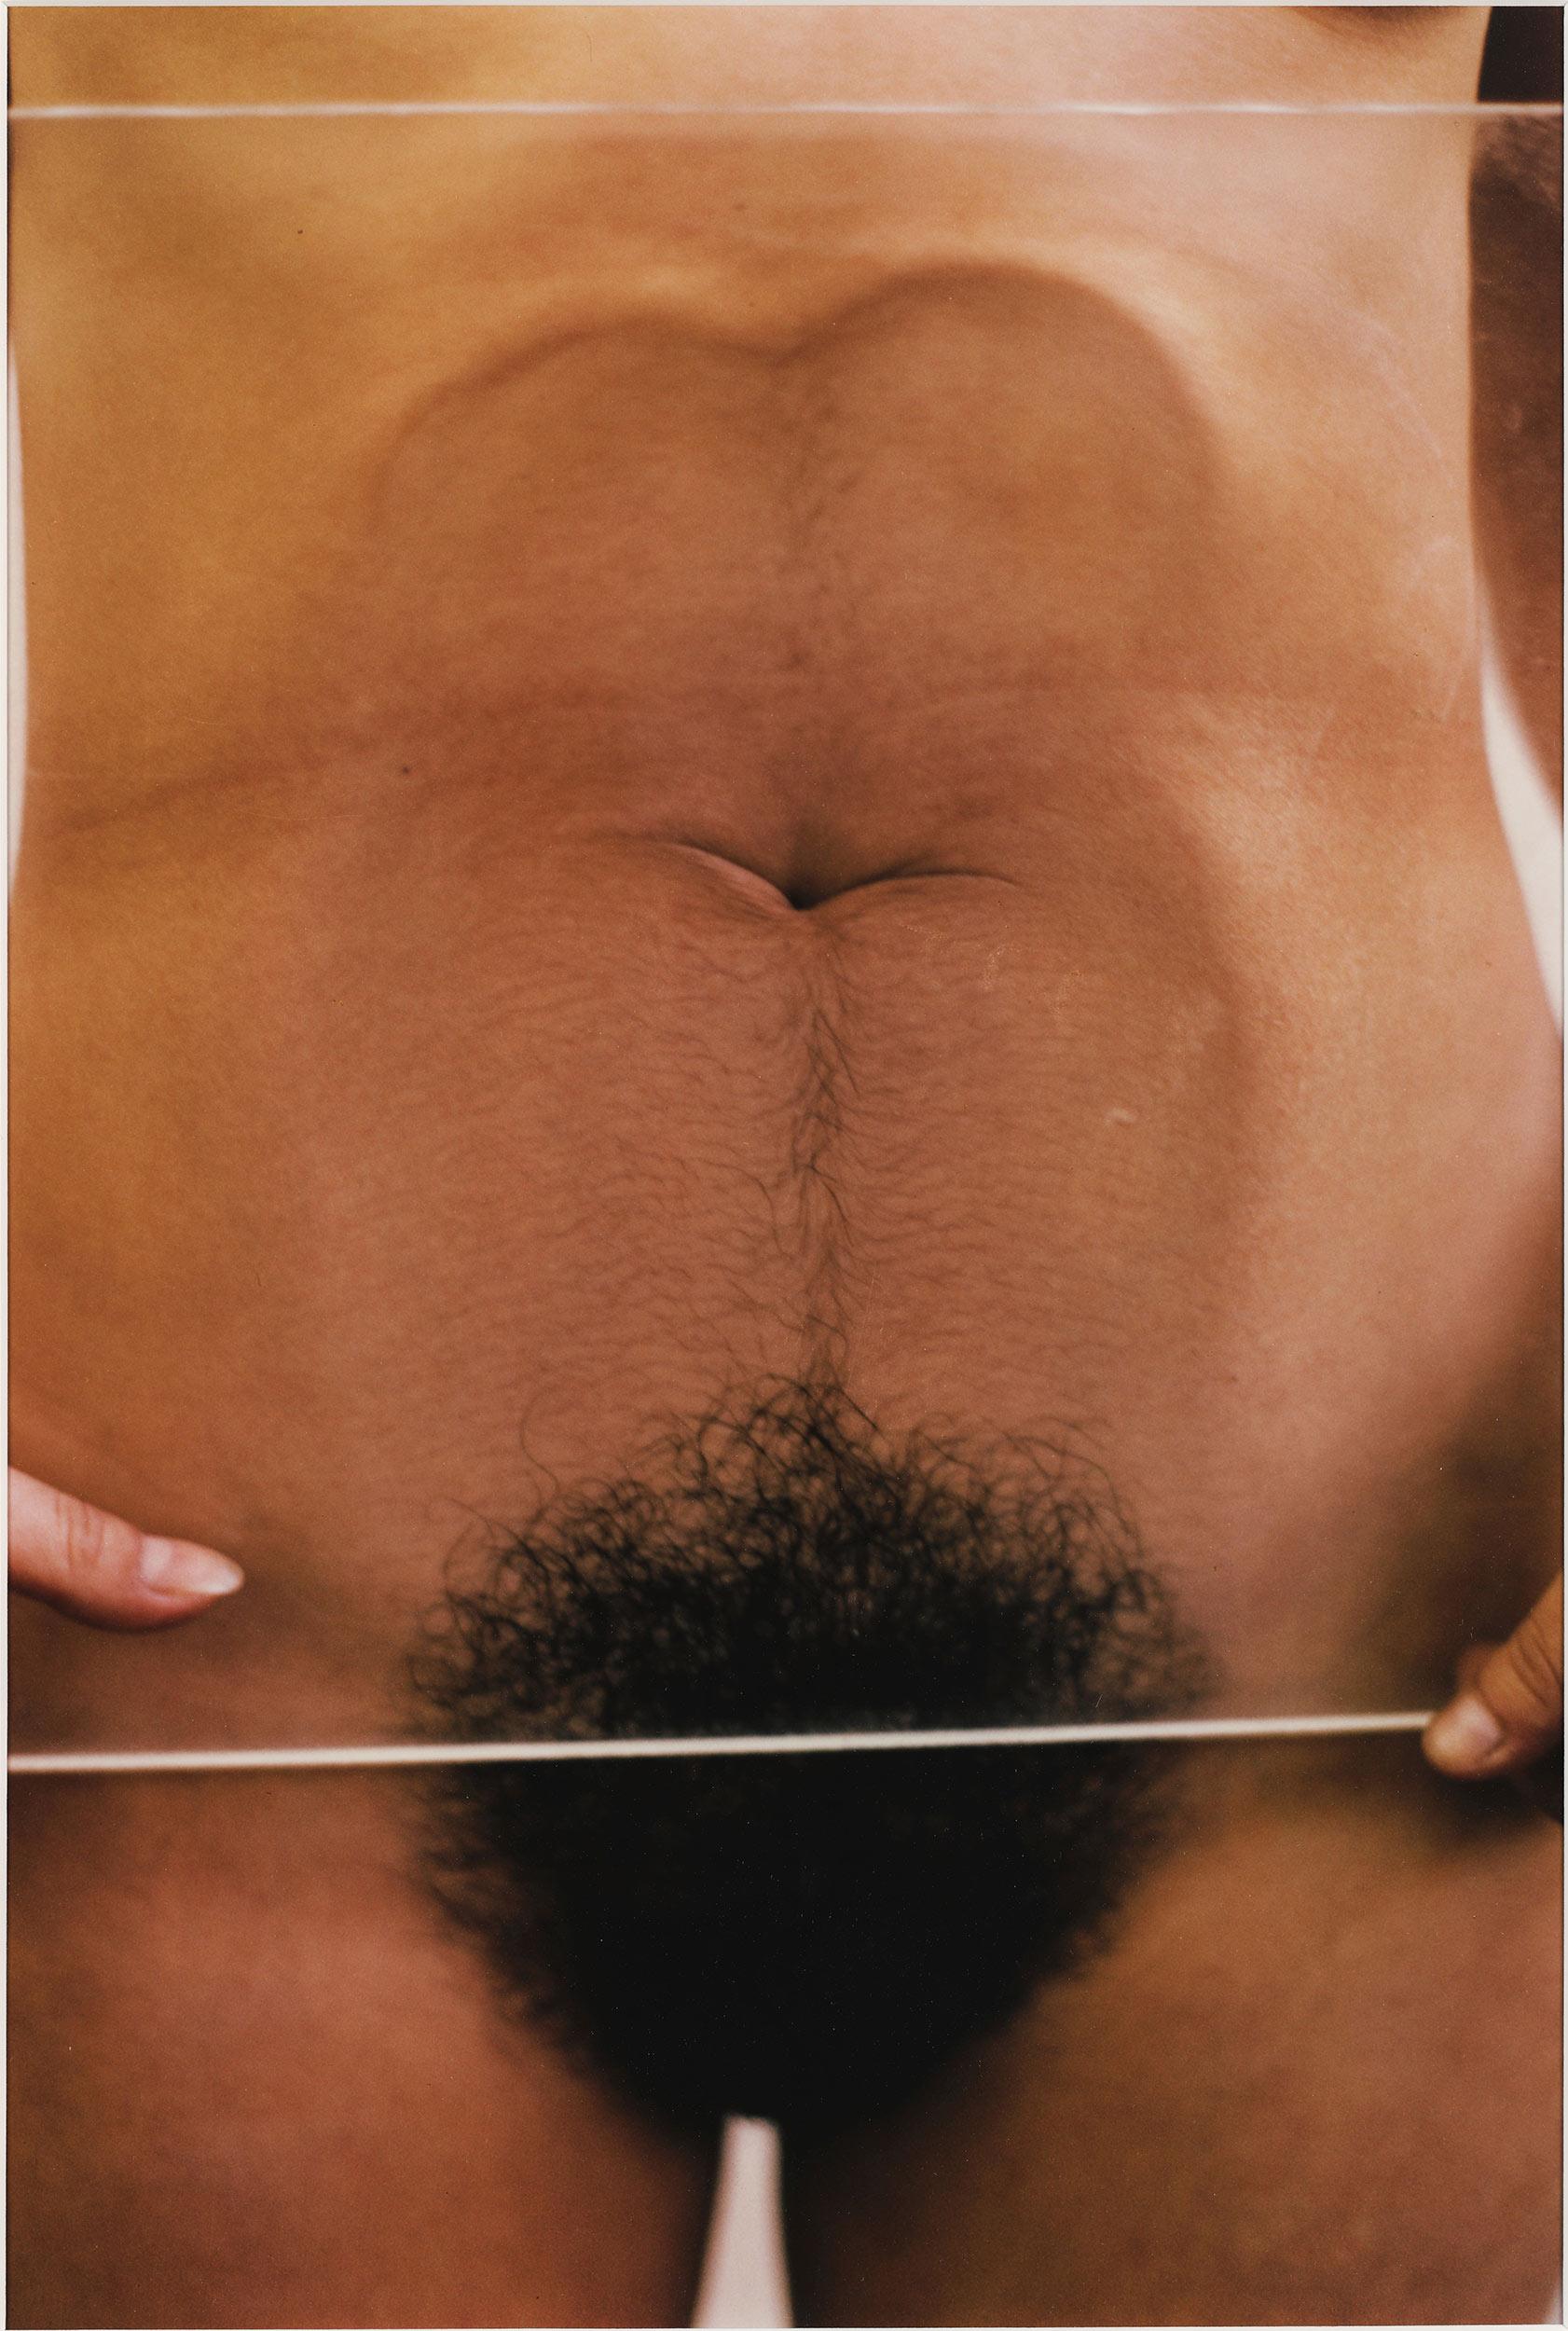 Ana Mendieta, Untitled (Glass on Body), 1972.